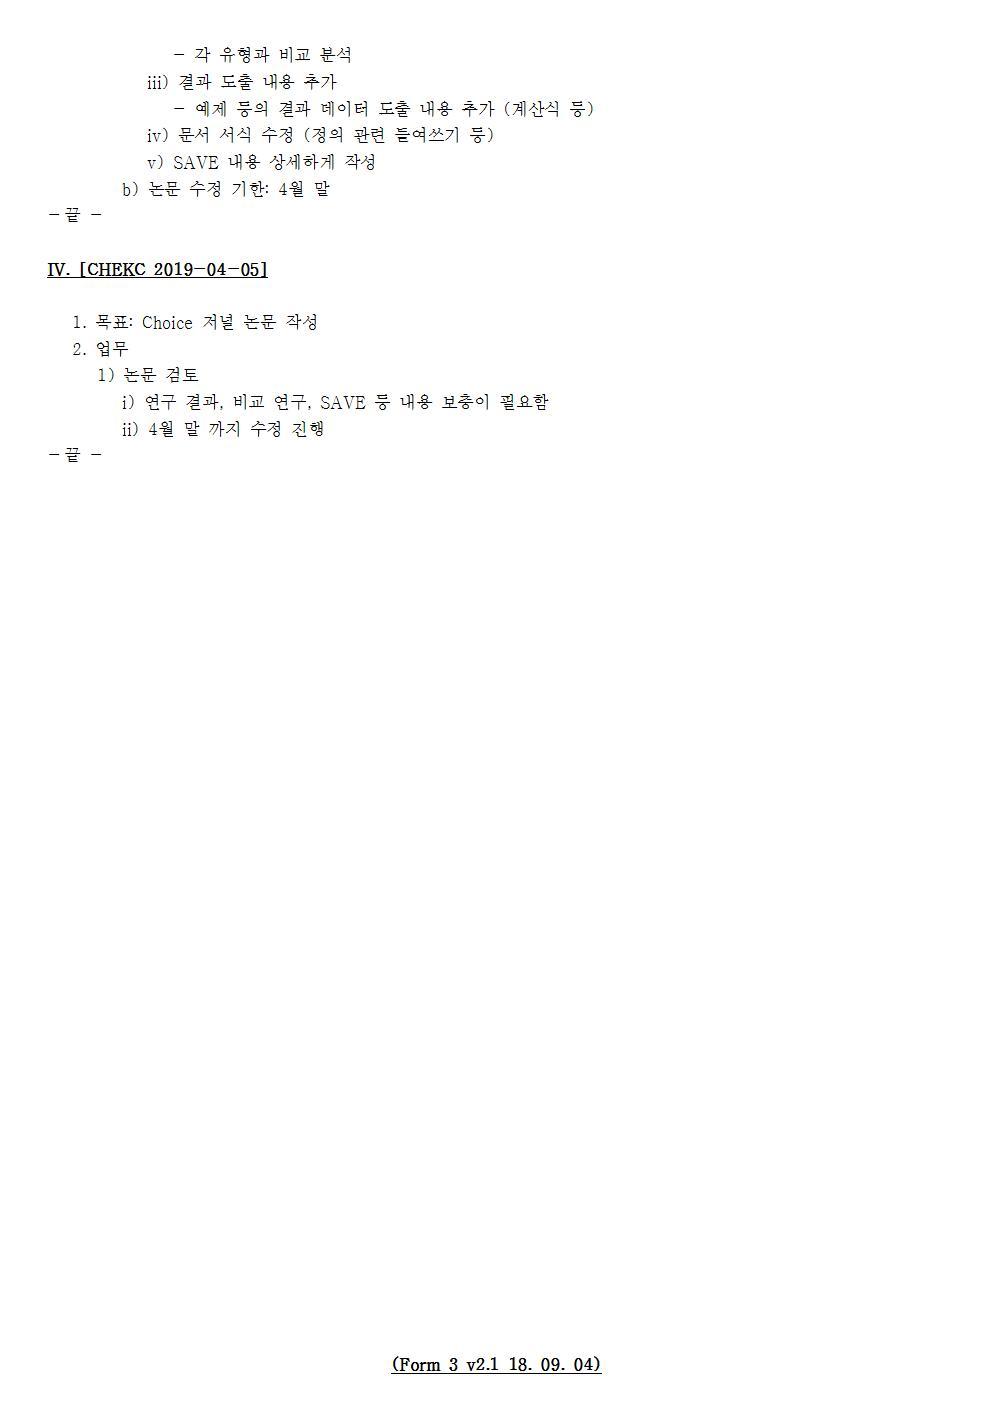 D-[19-011-PP-03]-[Choice Journal]-[2019-04-05][YB]002.jpg